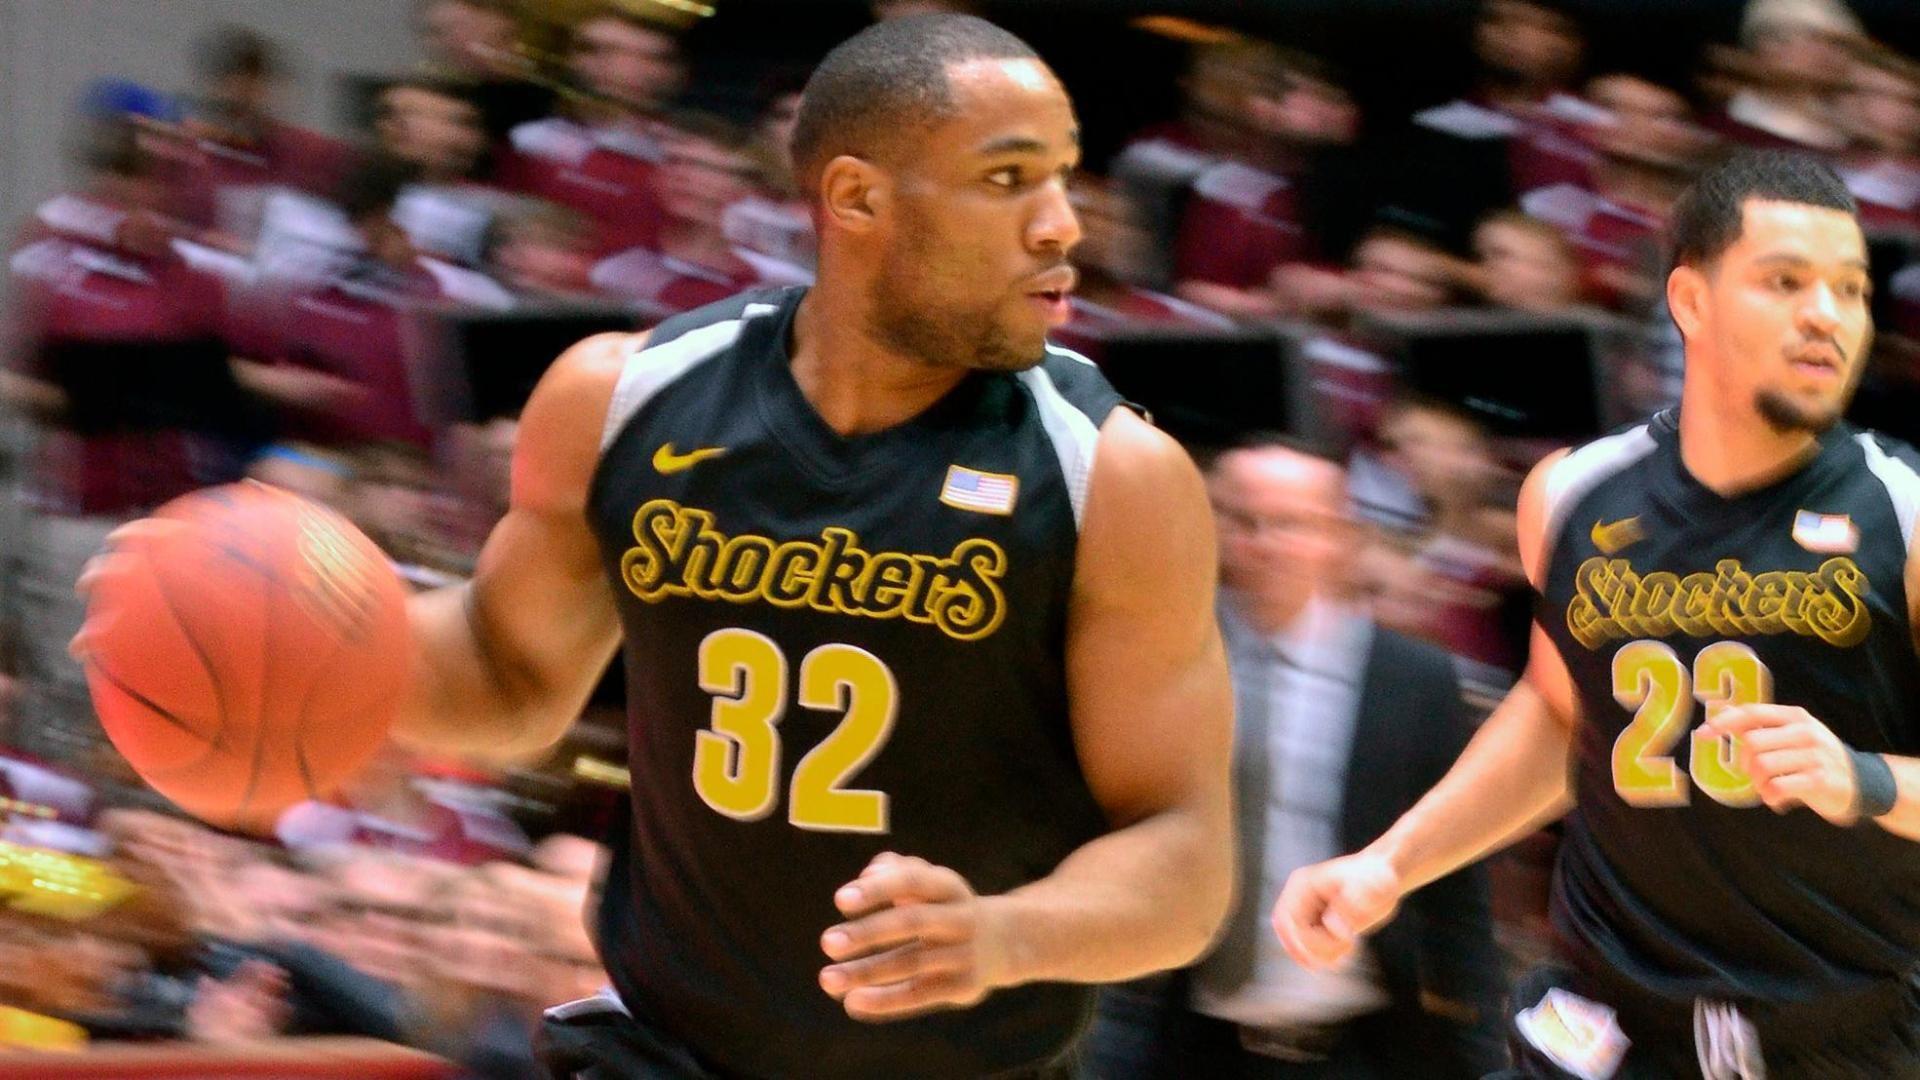 Wichita St Men's College Basketball - Shockers News, Scores, Videos - College Basketball - ESPN